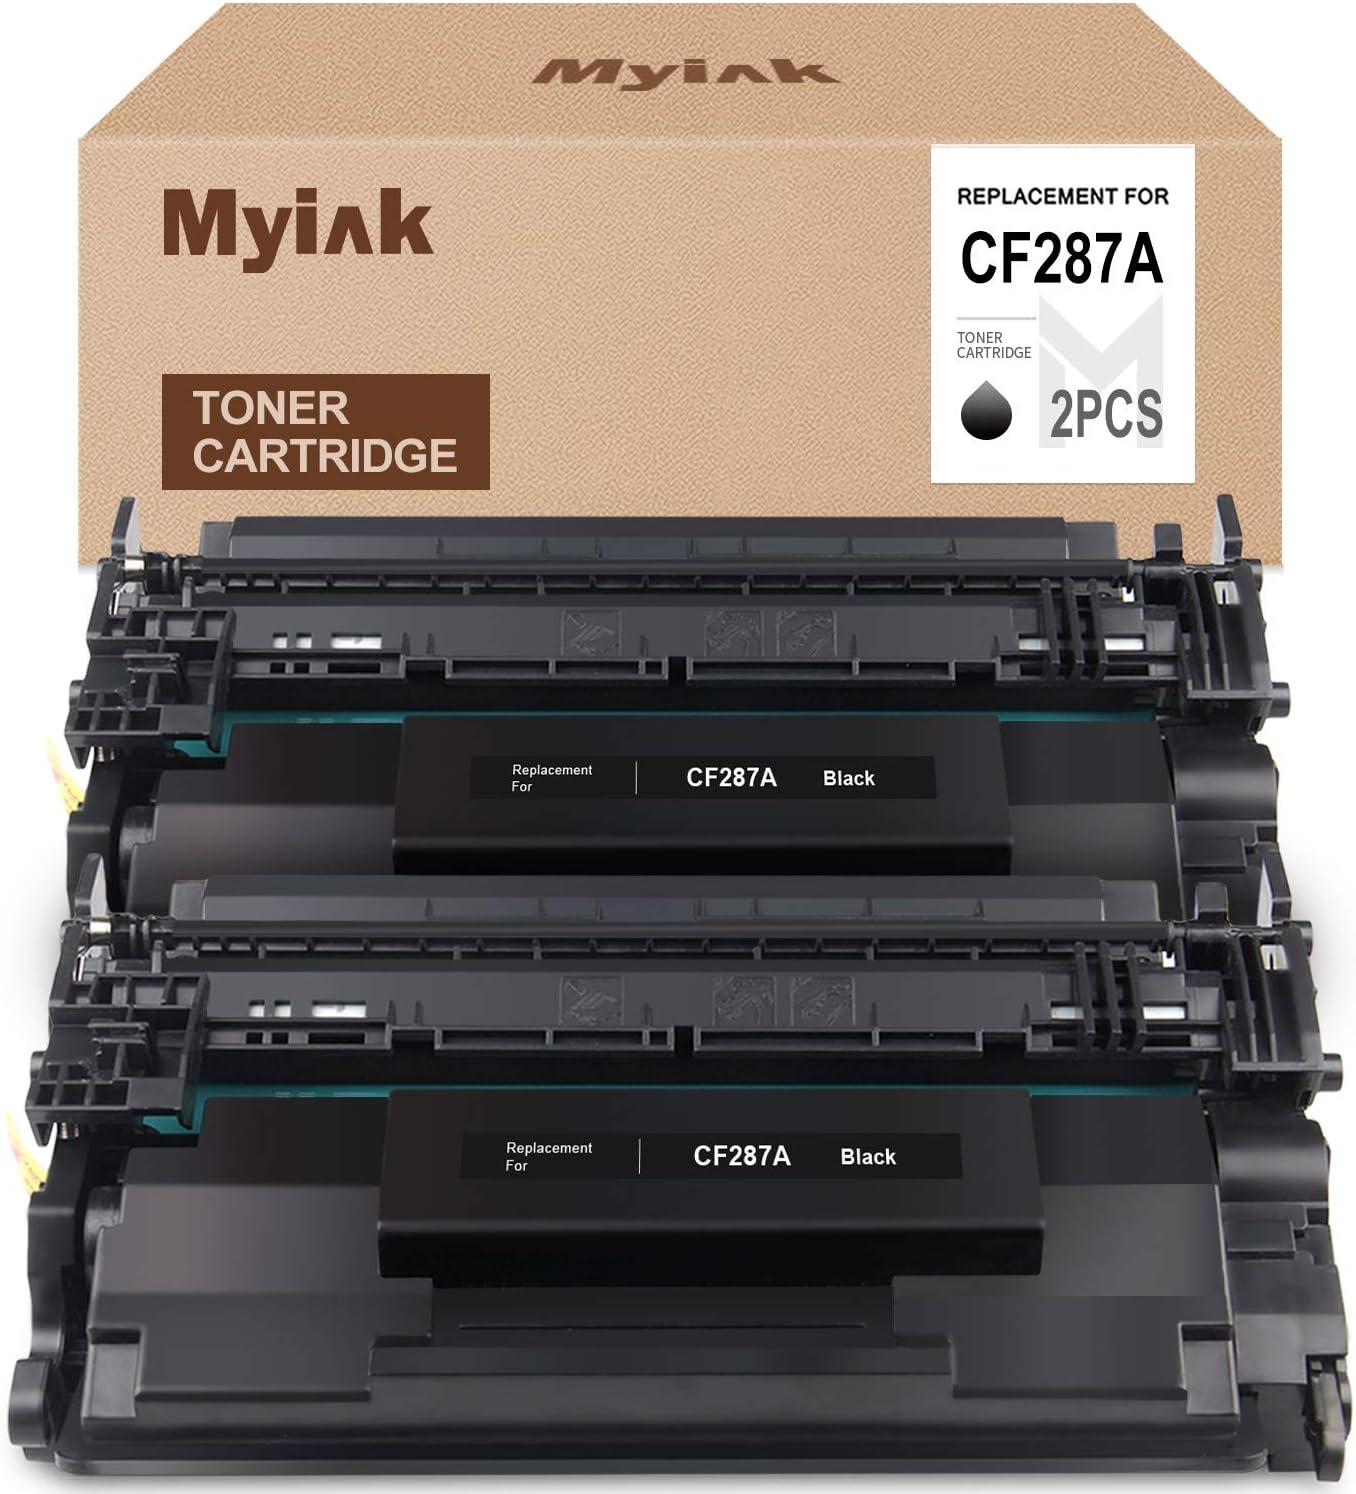 MYIK Compatible Toner Cartridge Replacement Wo Free Shipping Cheap Bargain Gift HP CF287A 87A Regular dealer for